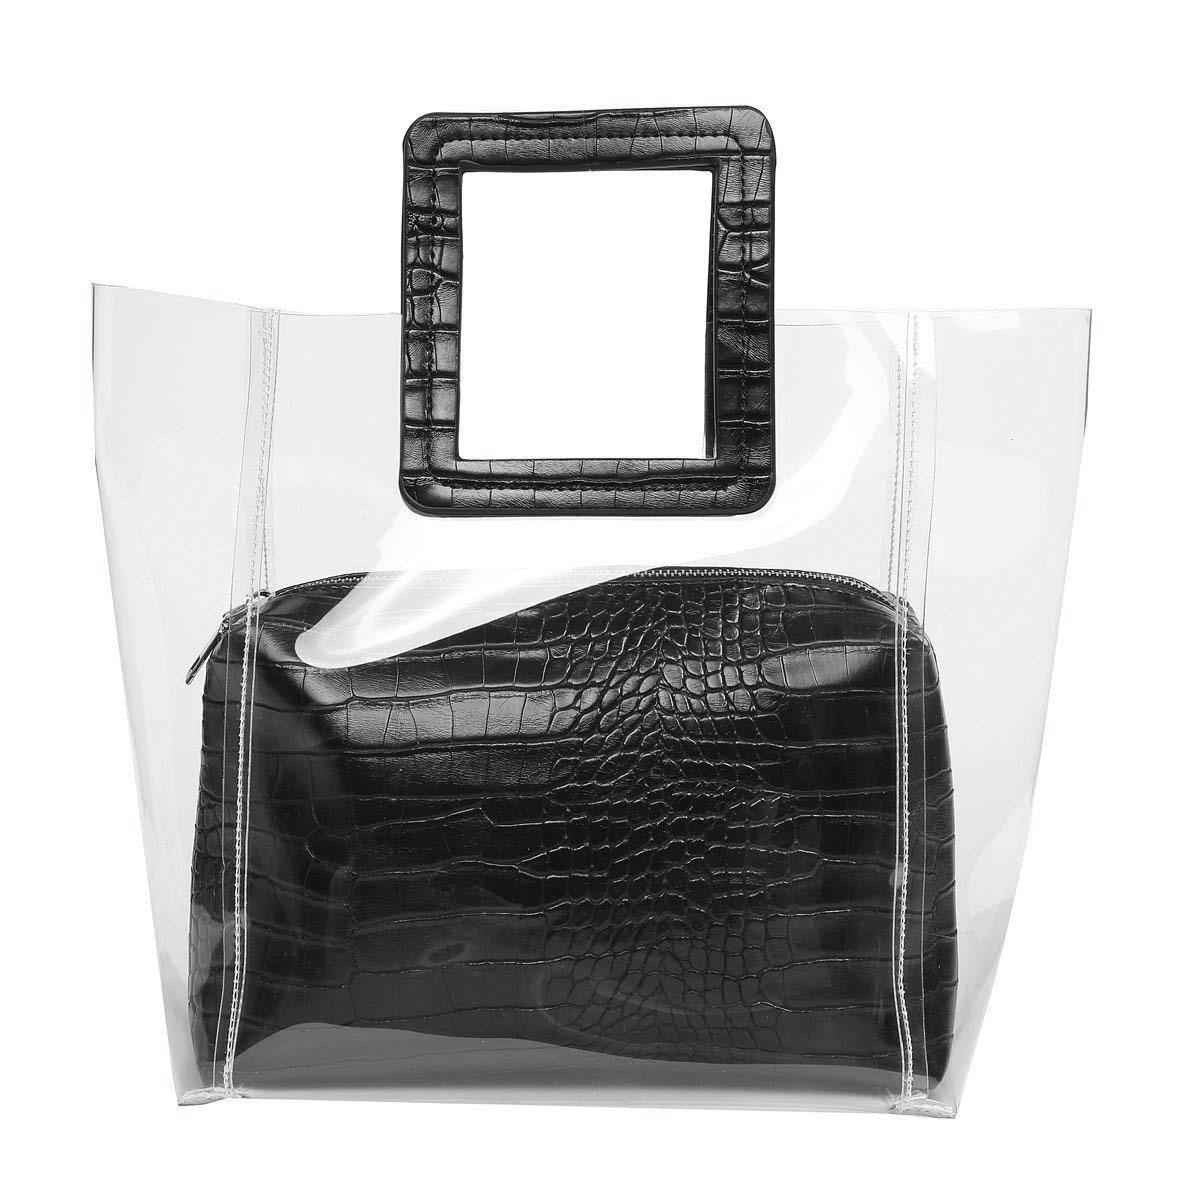 Classy Waterprof Clear Tote Beach Shoulder Crossbody BagClassy Waterprof Clear Tote Beach Shoulder Crossbody Bag